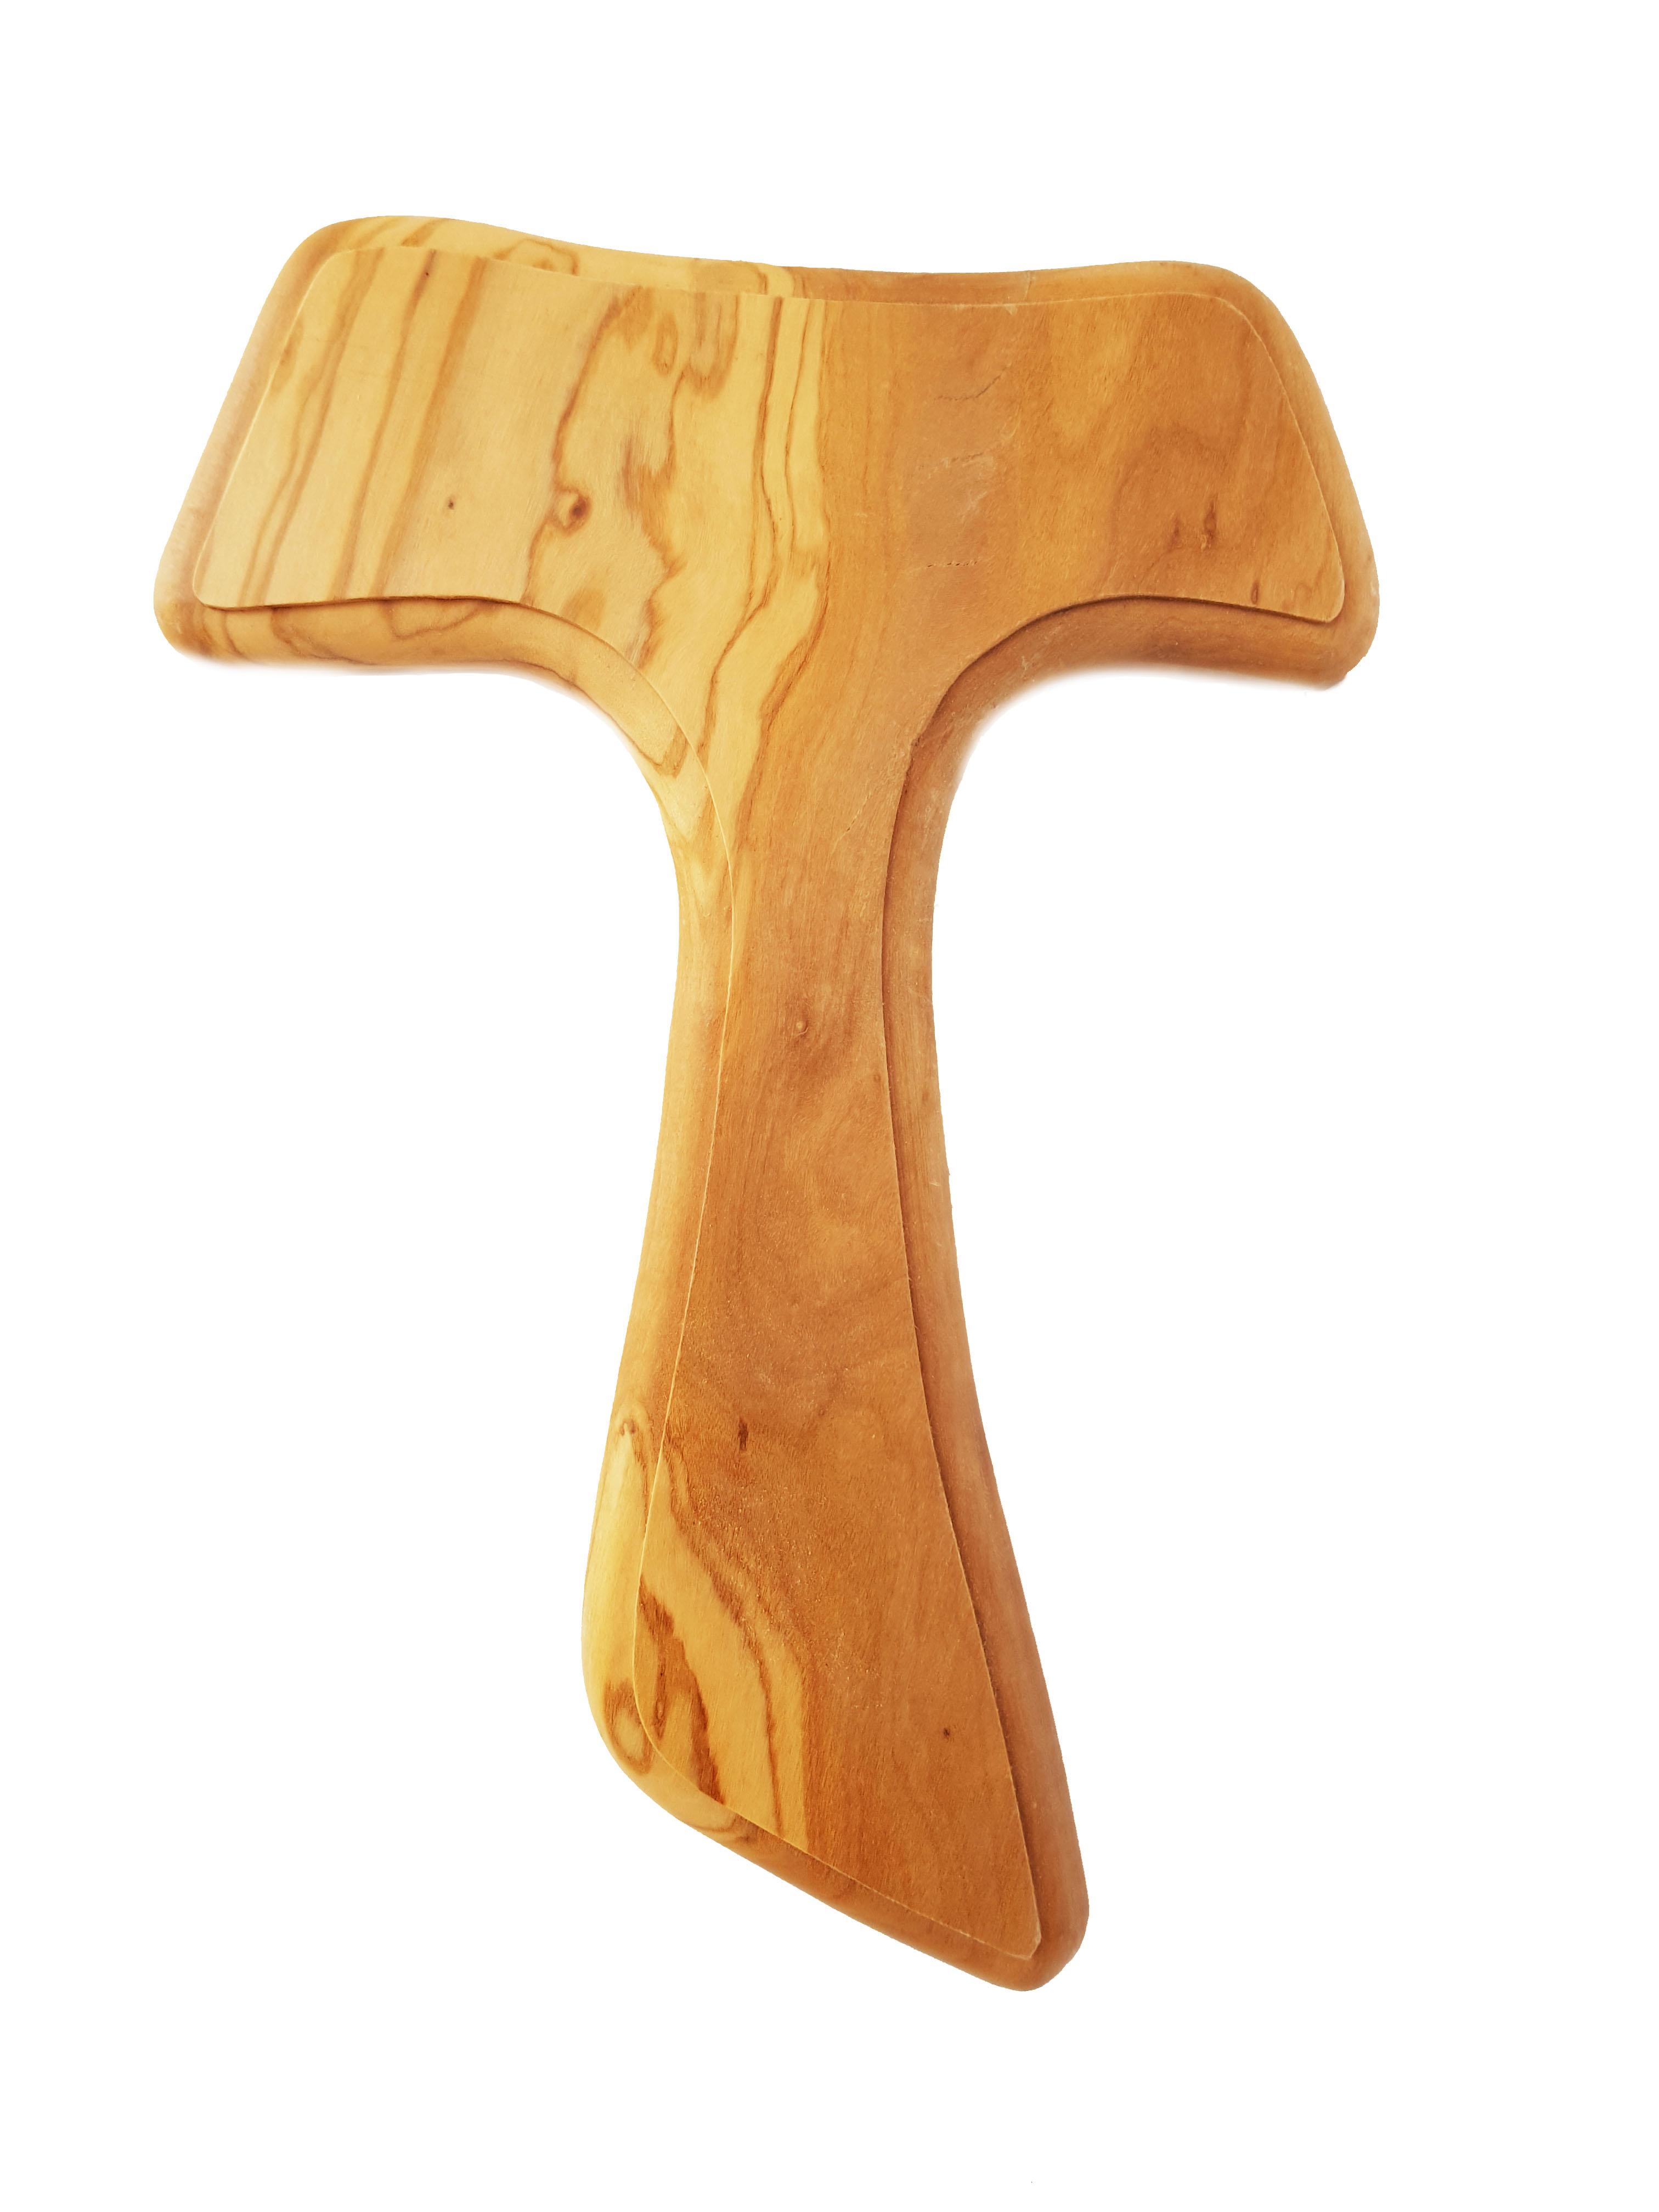 Croce.Croce Tau Semplice Gli Arcangeli Assisi Shop Online